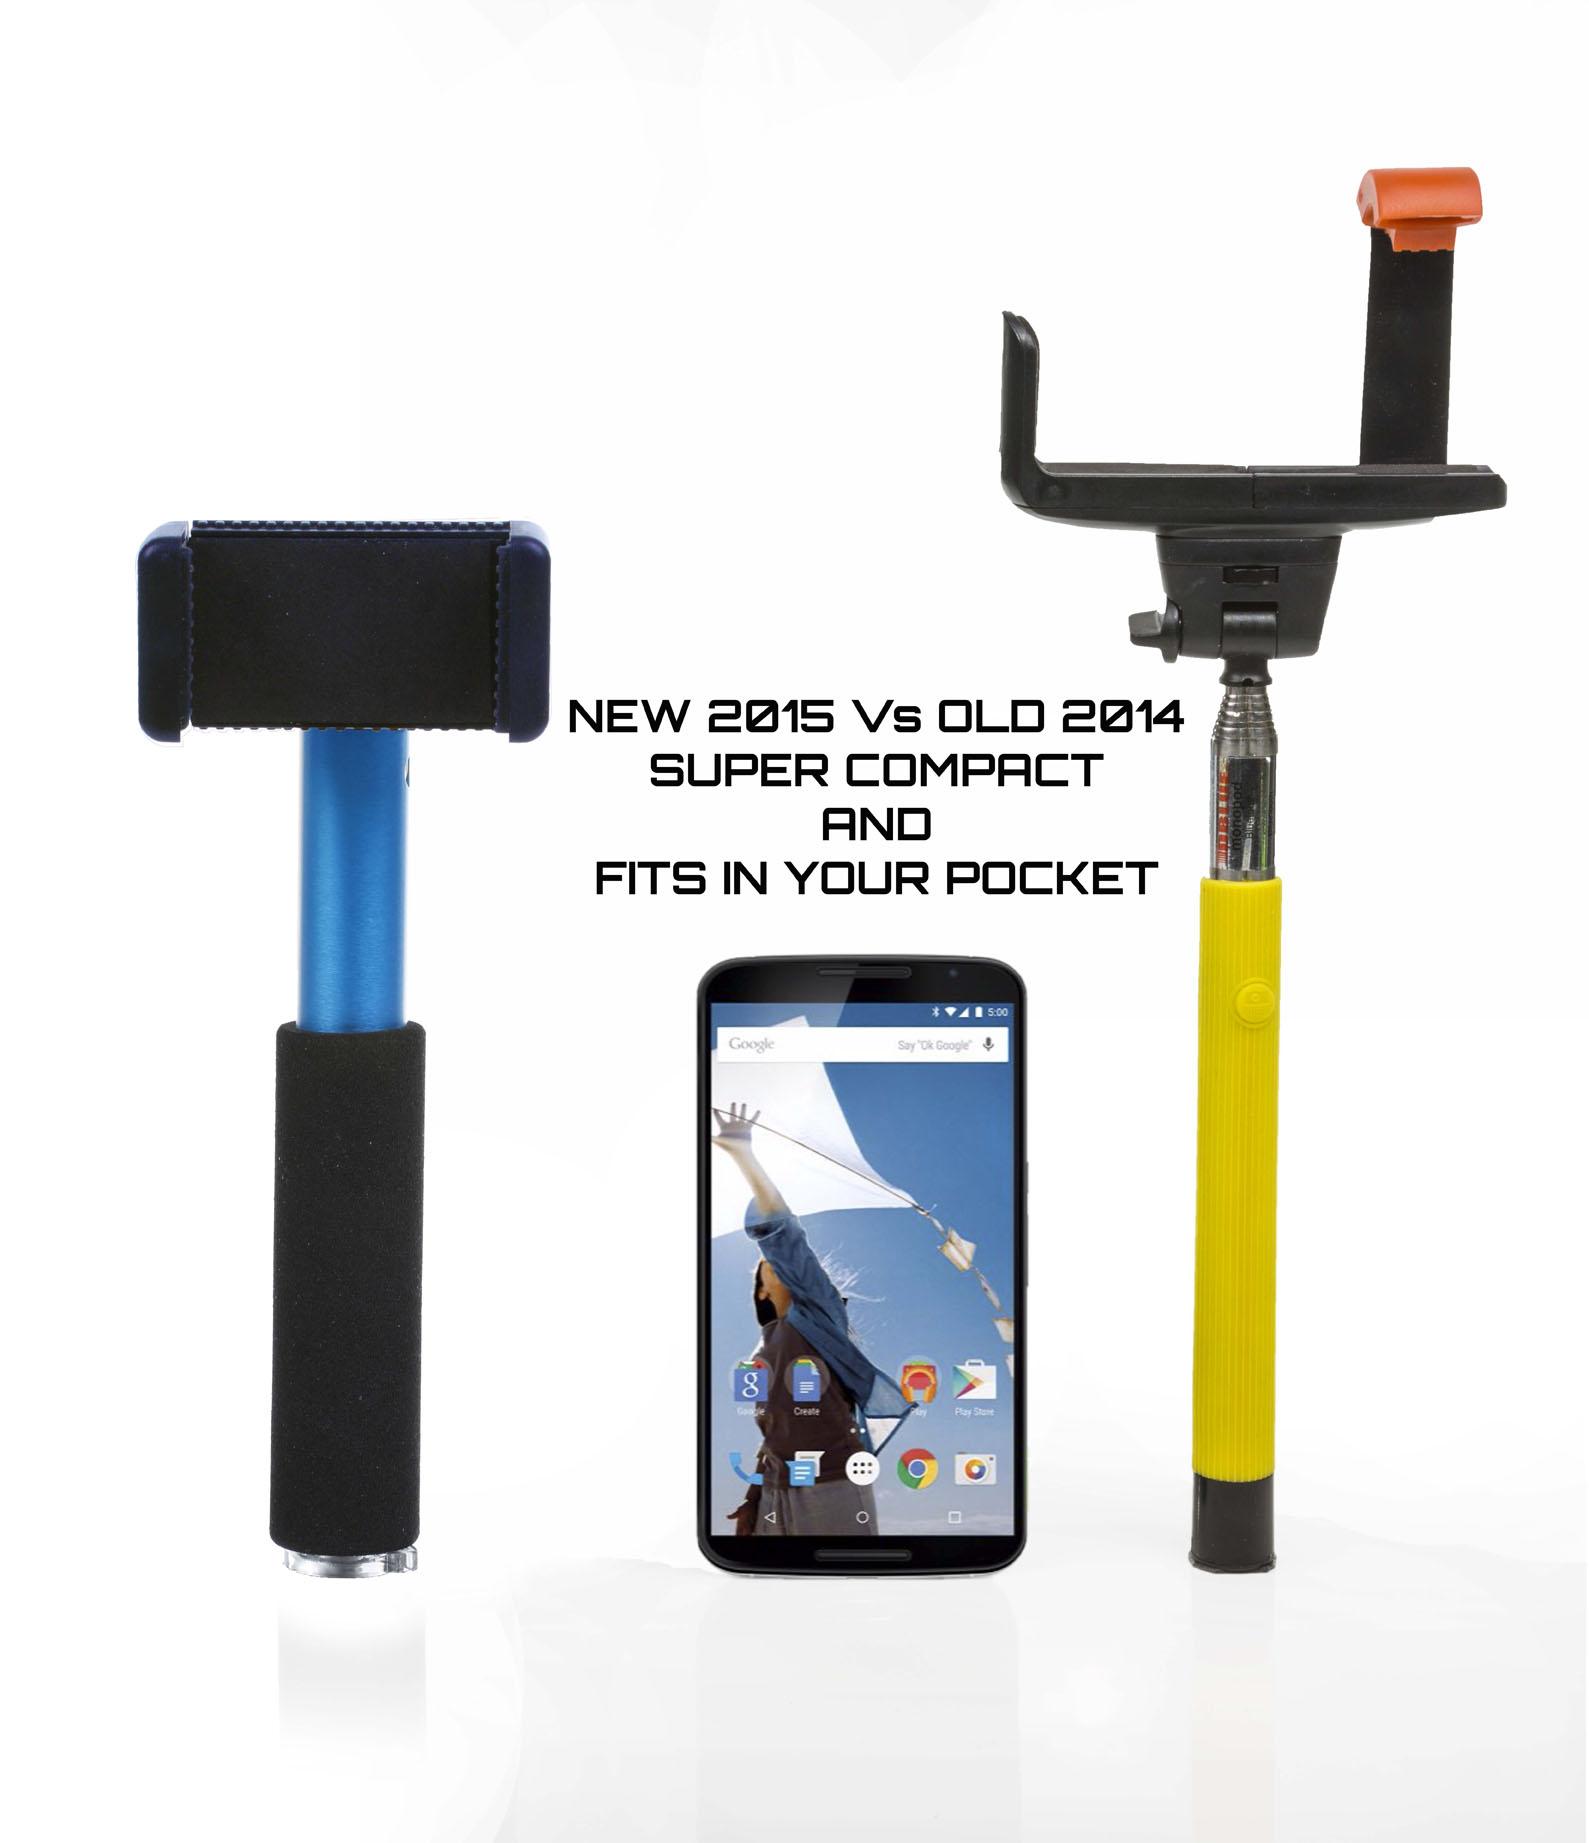 motorola monopod selfie stick 75cm telescopic compact bluetooth tripod remo. Black Bedroom Furniture Sets. Home Design Ideas